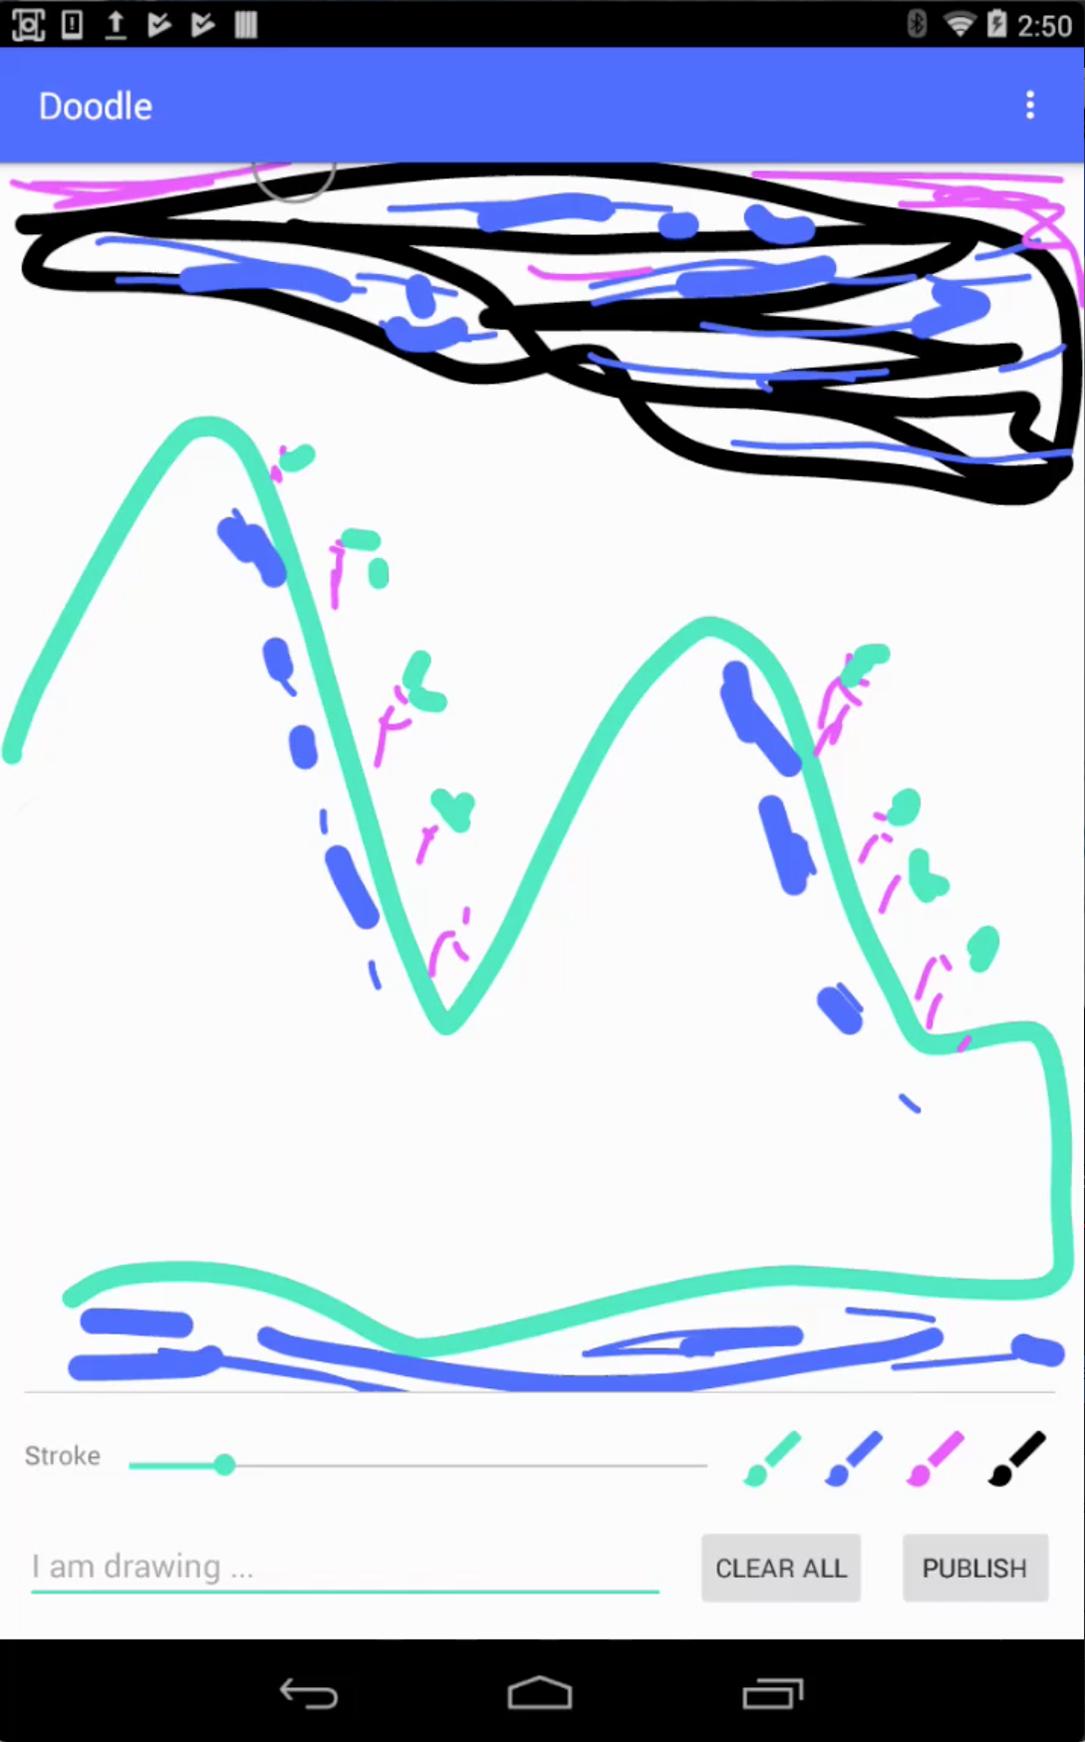 doodleapp_screenshot_canvas_1